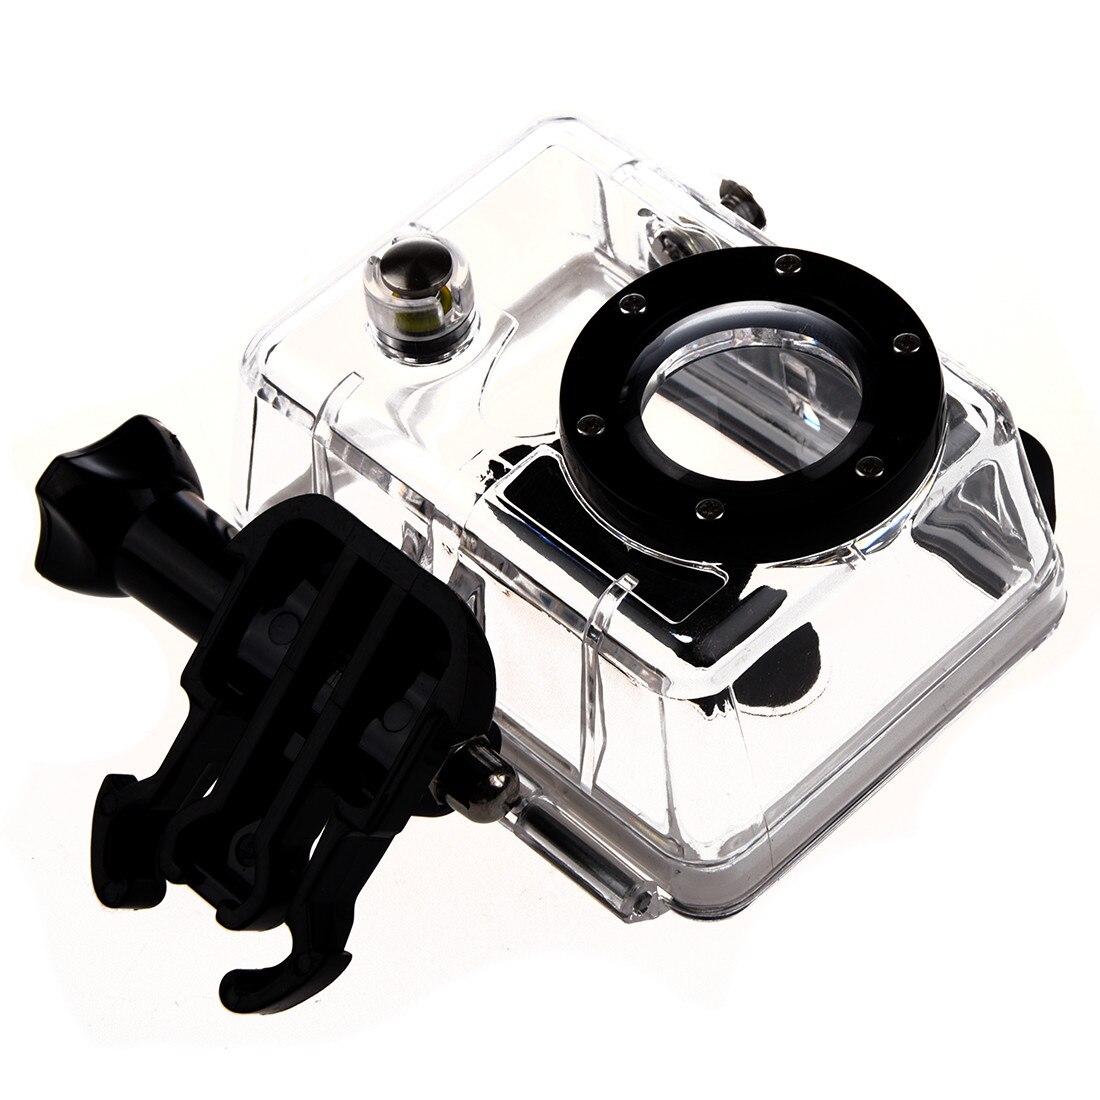 Waterproof Dive Housing Case Skeleton with Lens for Gopro Hero 2Waterproof Dive Housing Case Skeleton with Lens for Gopro Hero 2